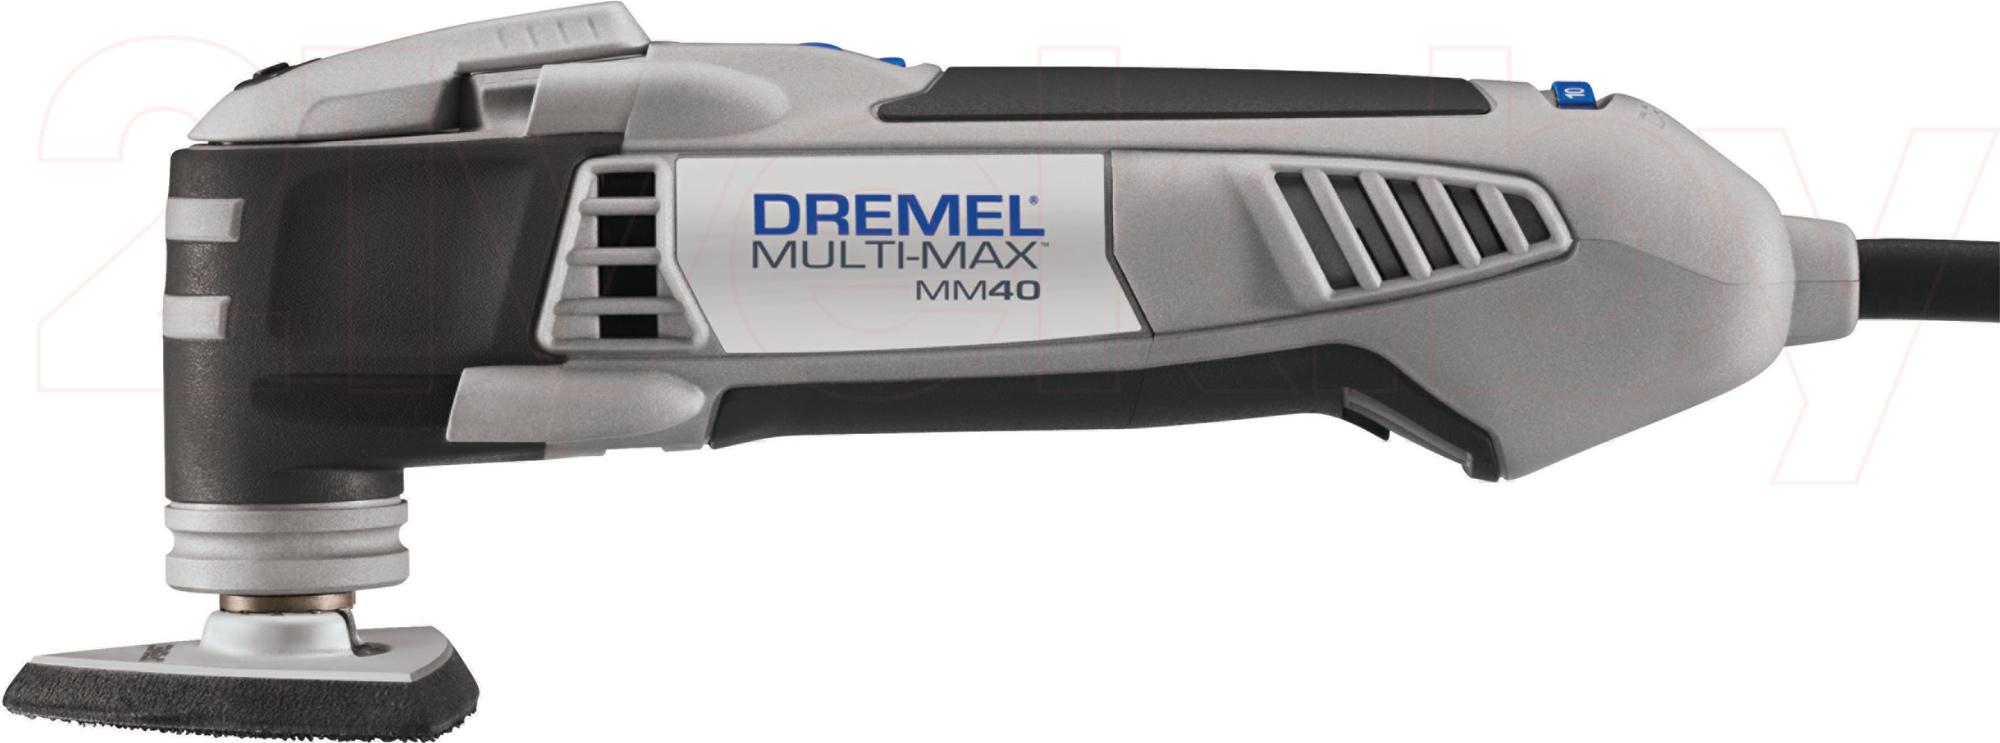 Multi-Max MM40 (MM40-1/9) 21vek.by 2783000.000